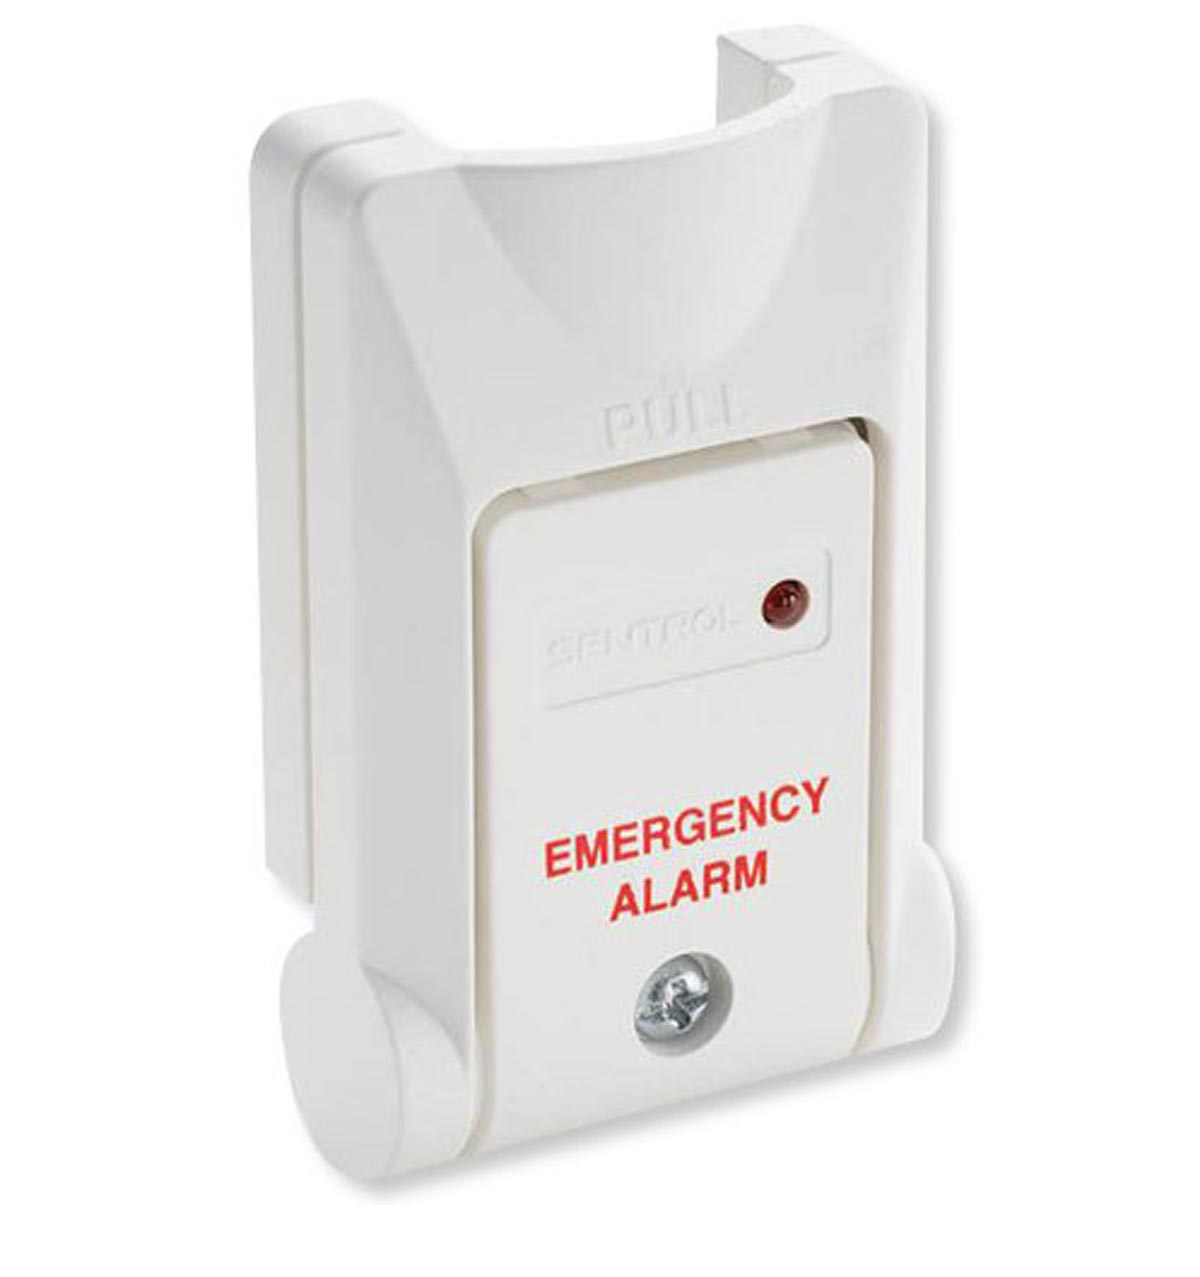 panic switch key switch security switch door switch security door key switch exit button door exit button emergency exit button